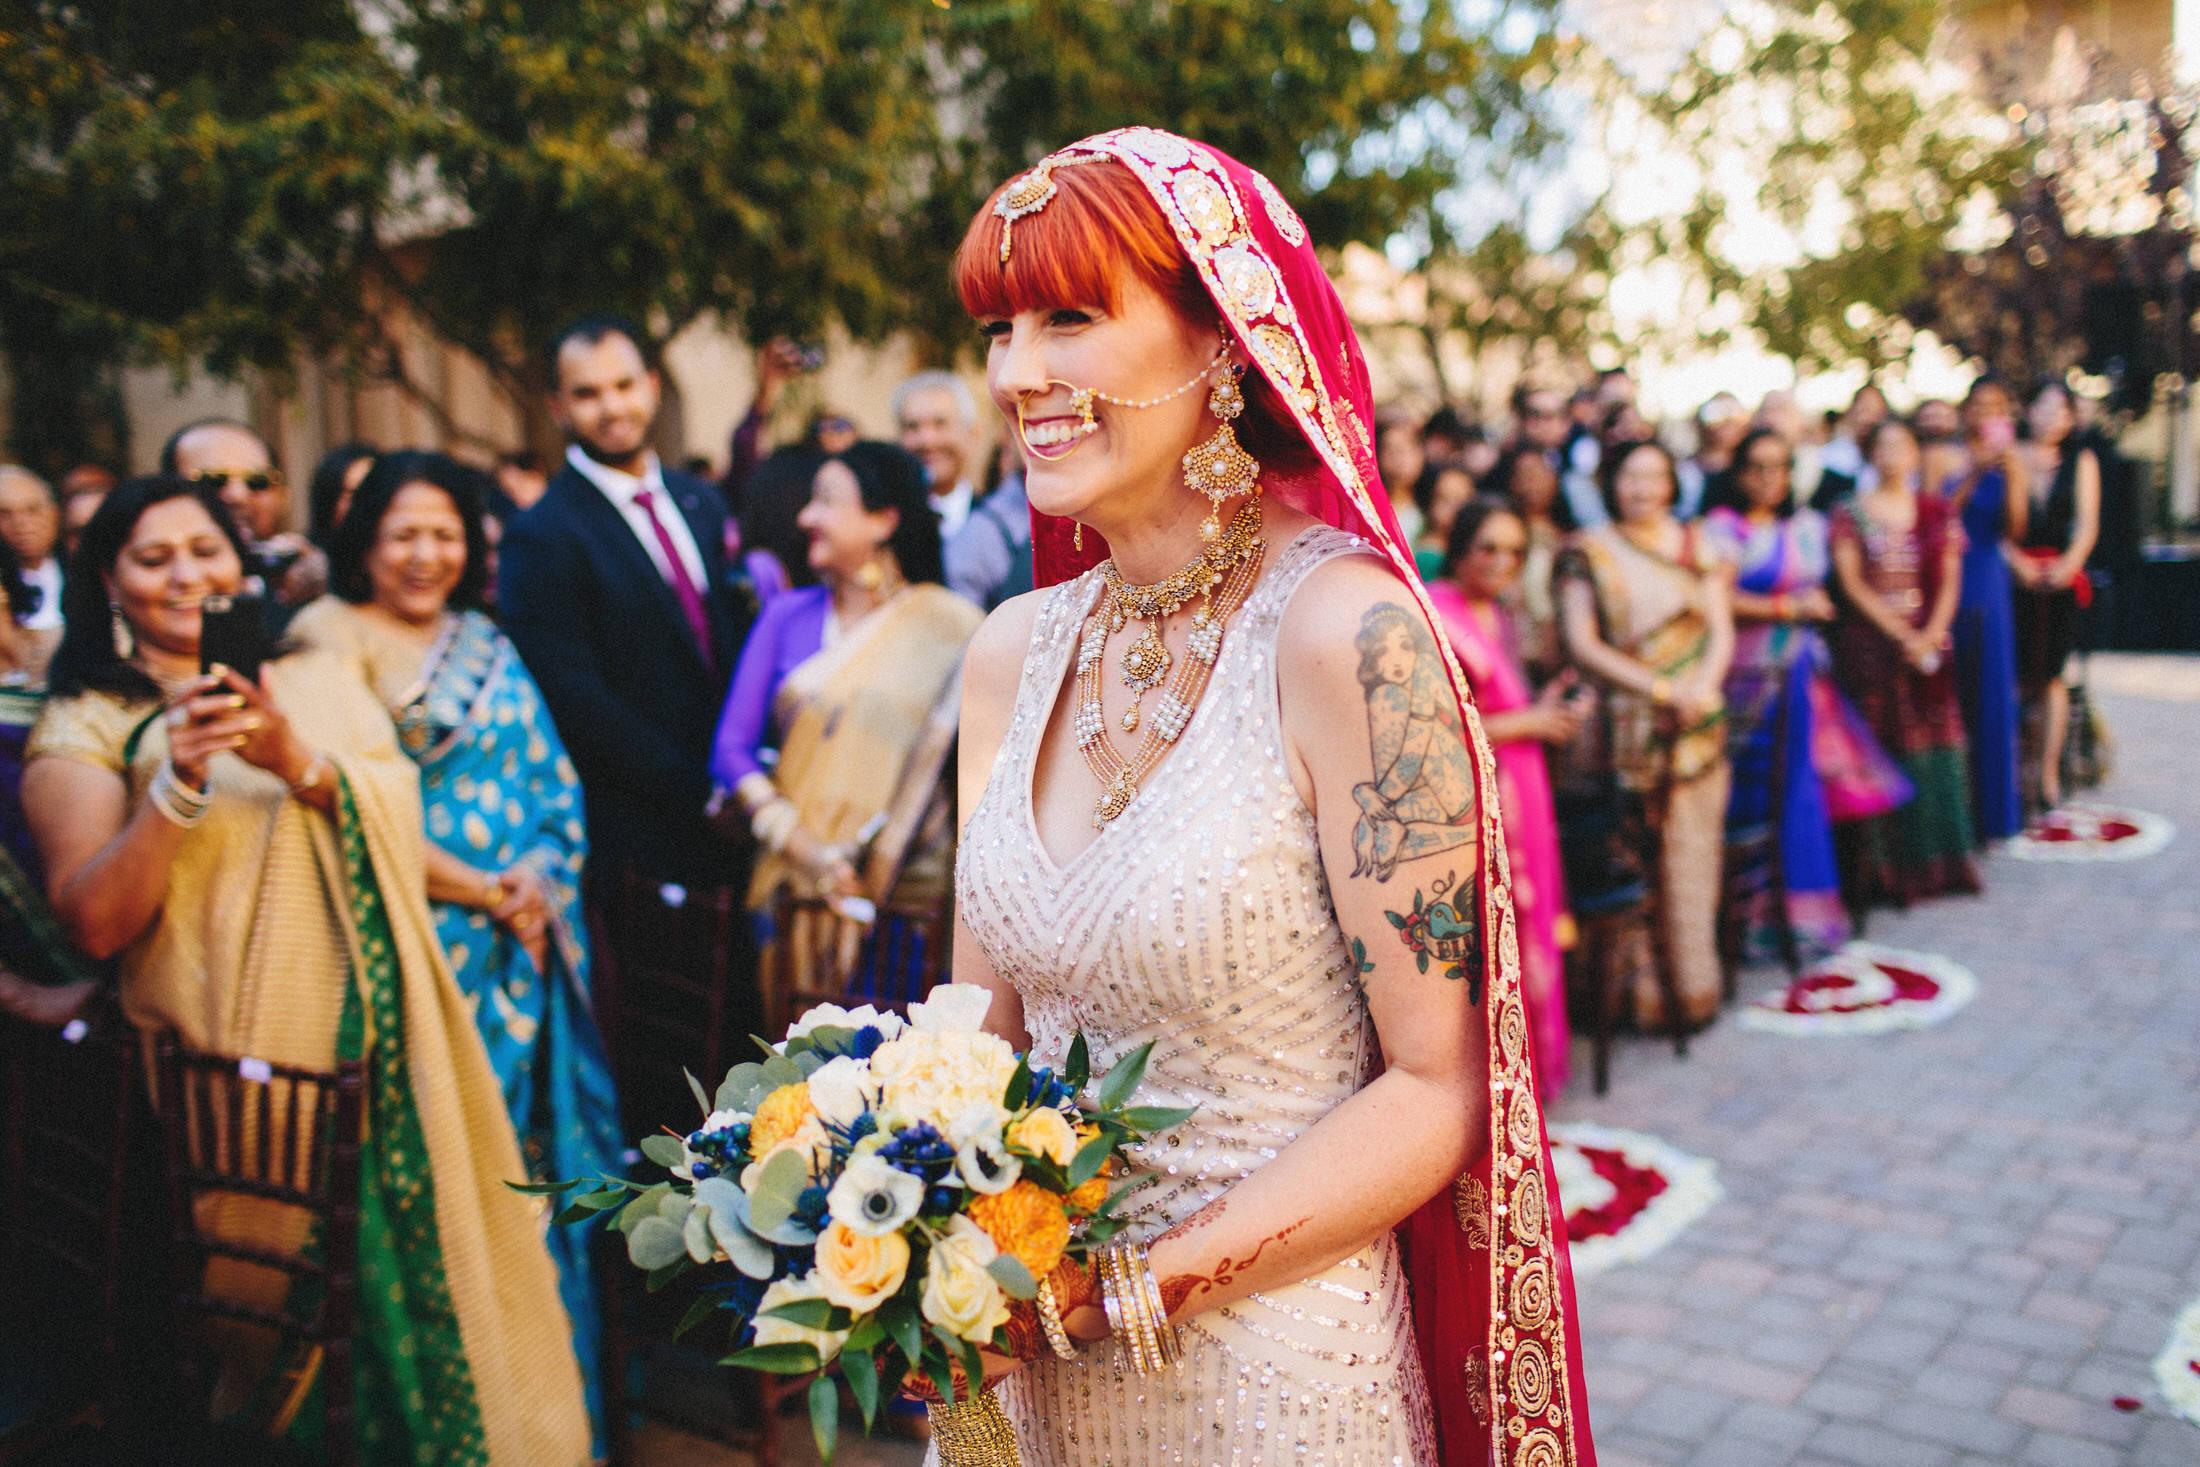 Modern-Indian-Serra-Plaza-wedding-055.jpg